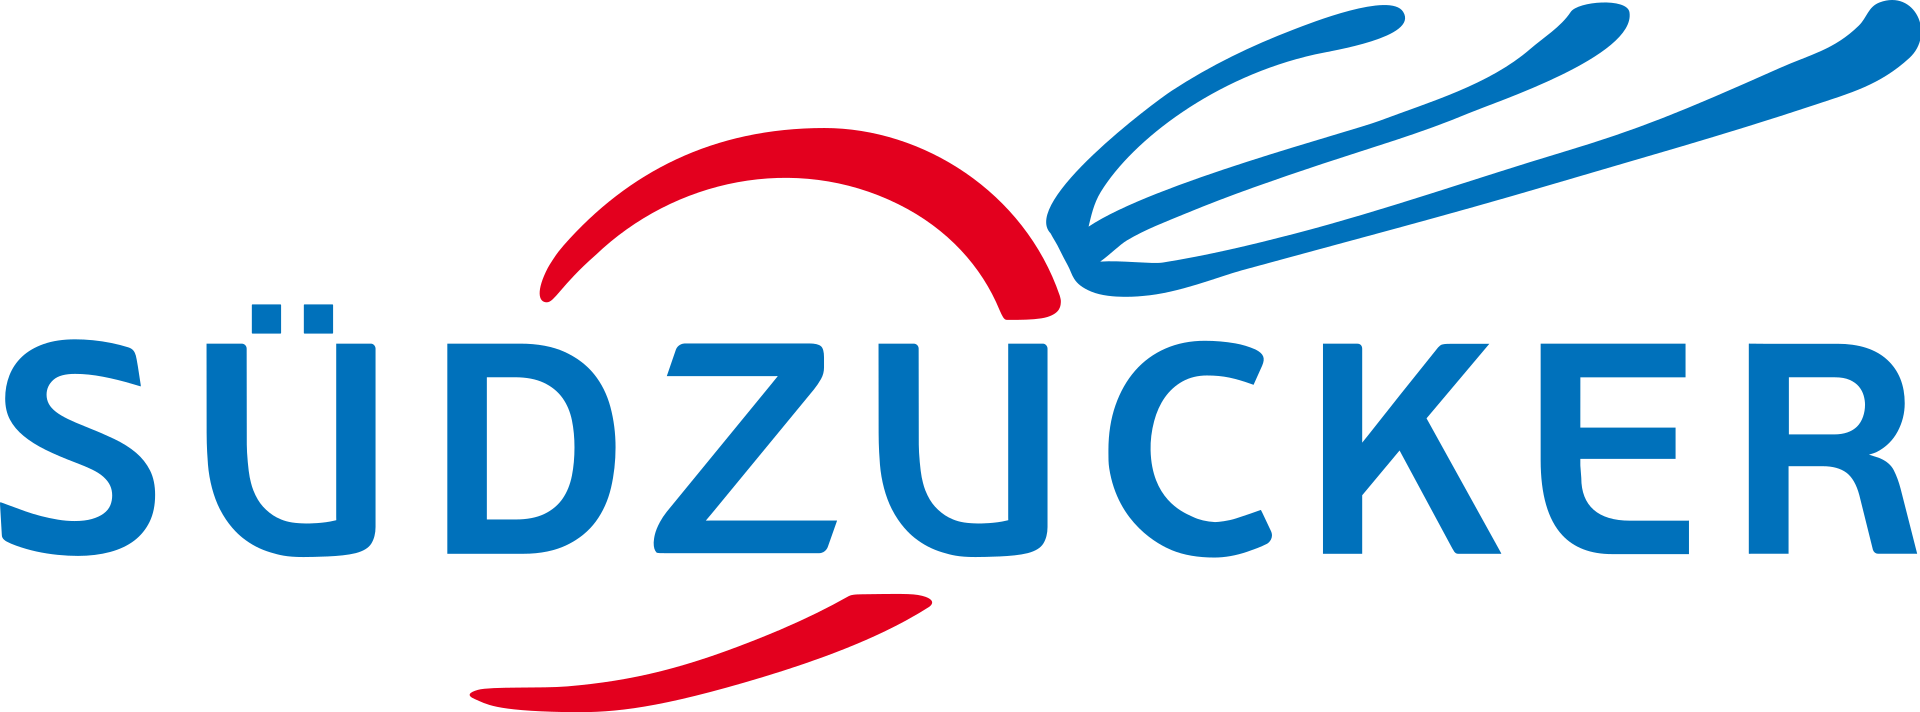 Suedzucker